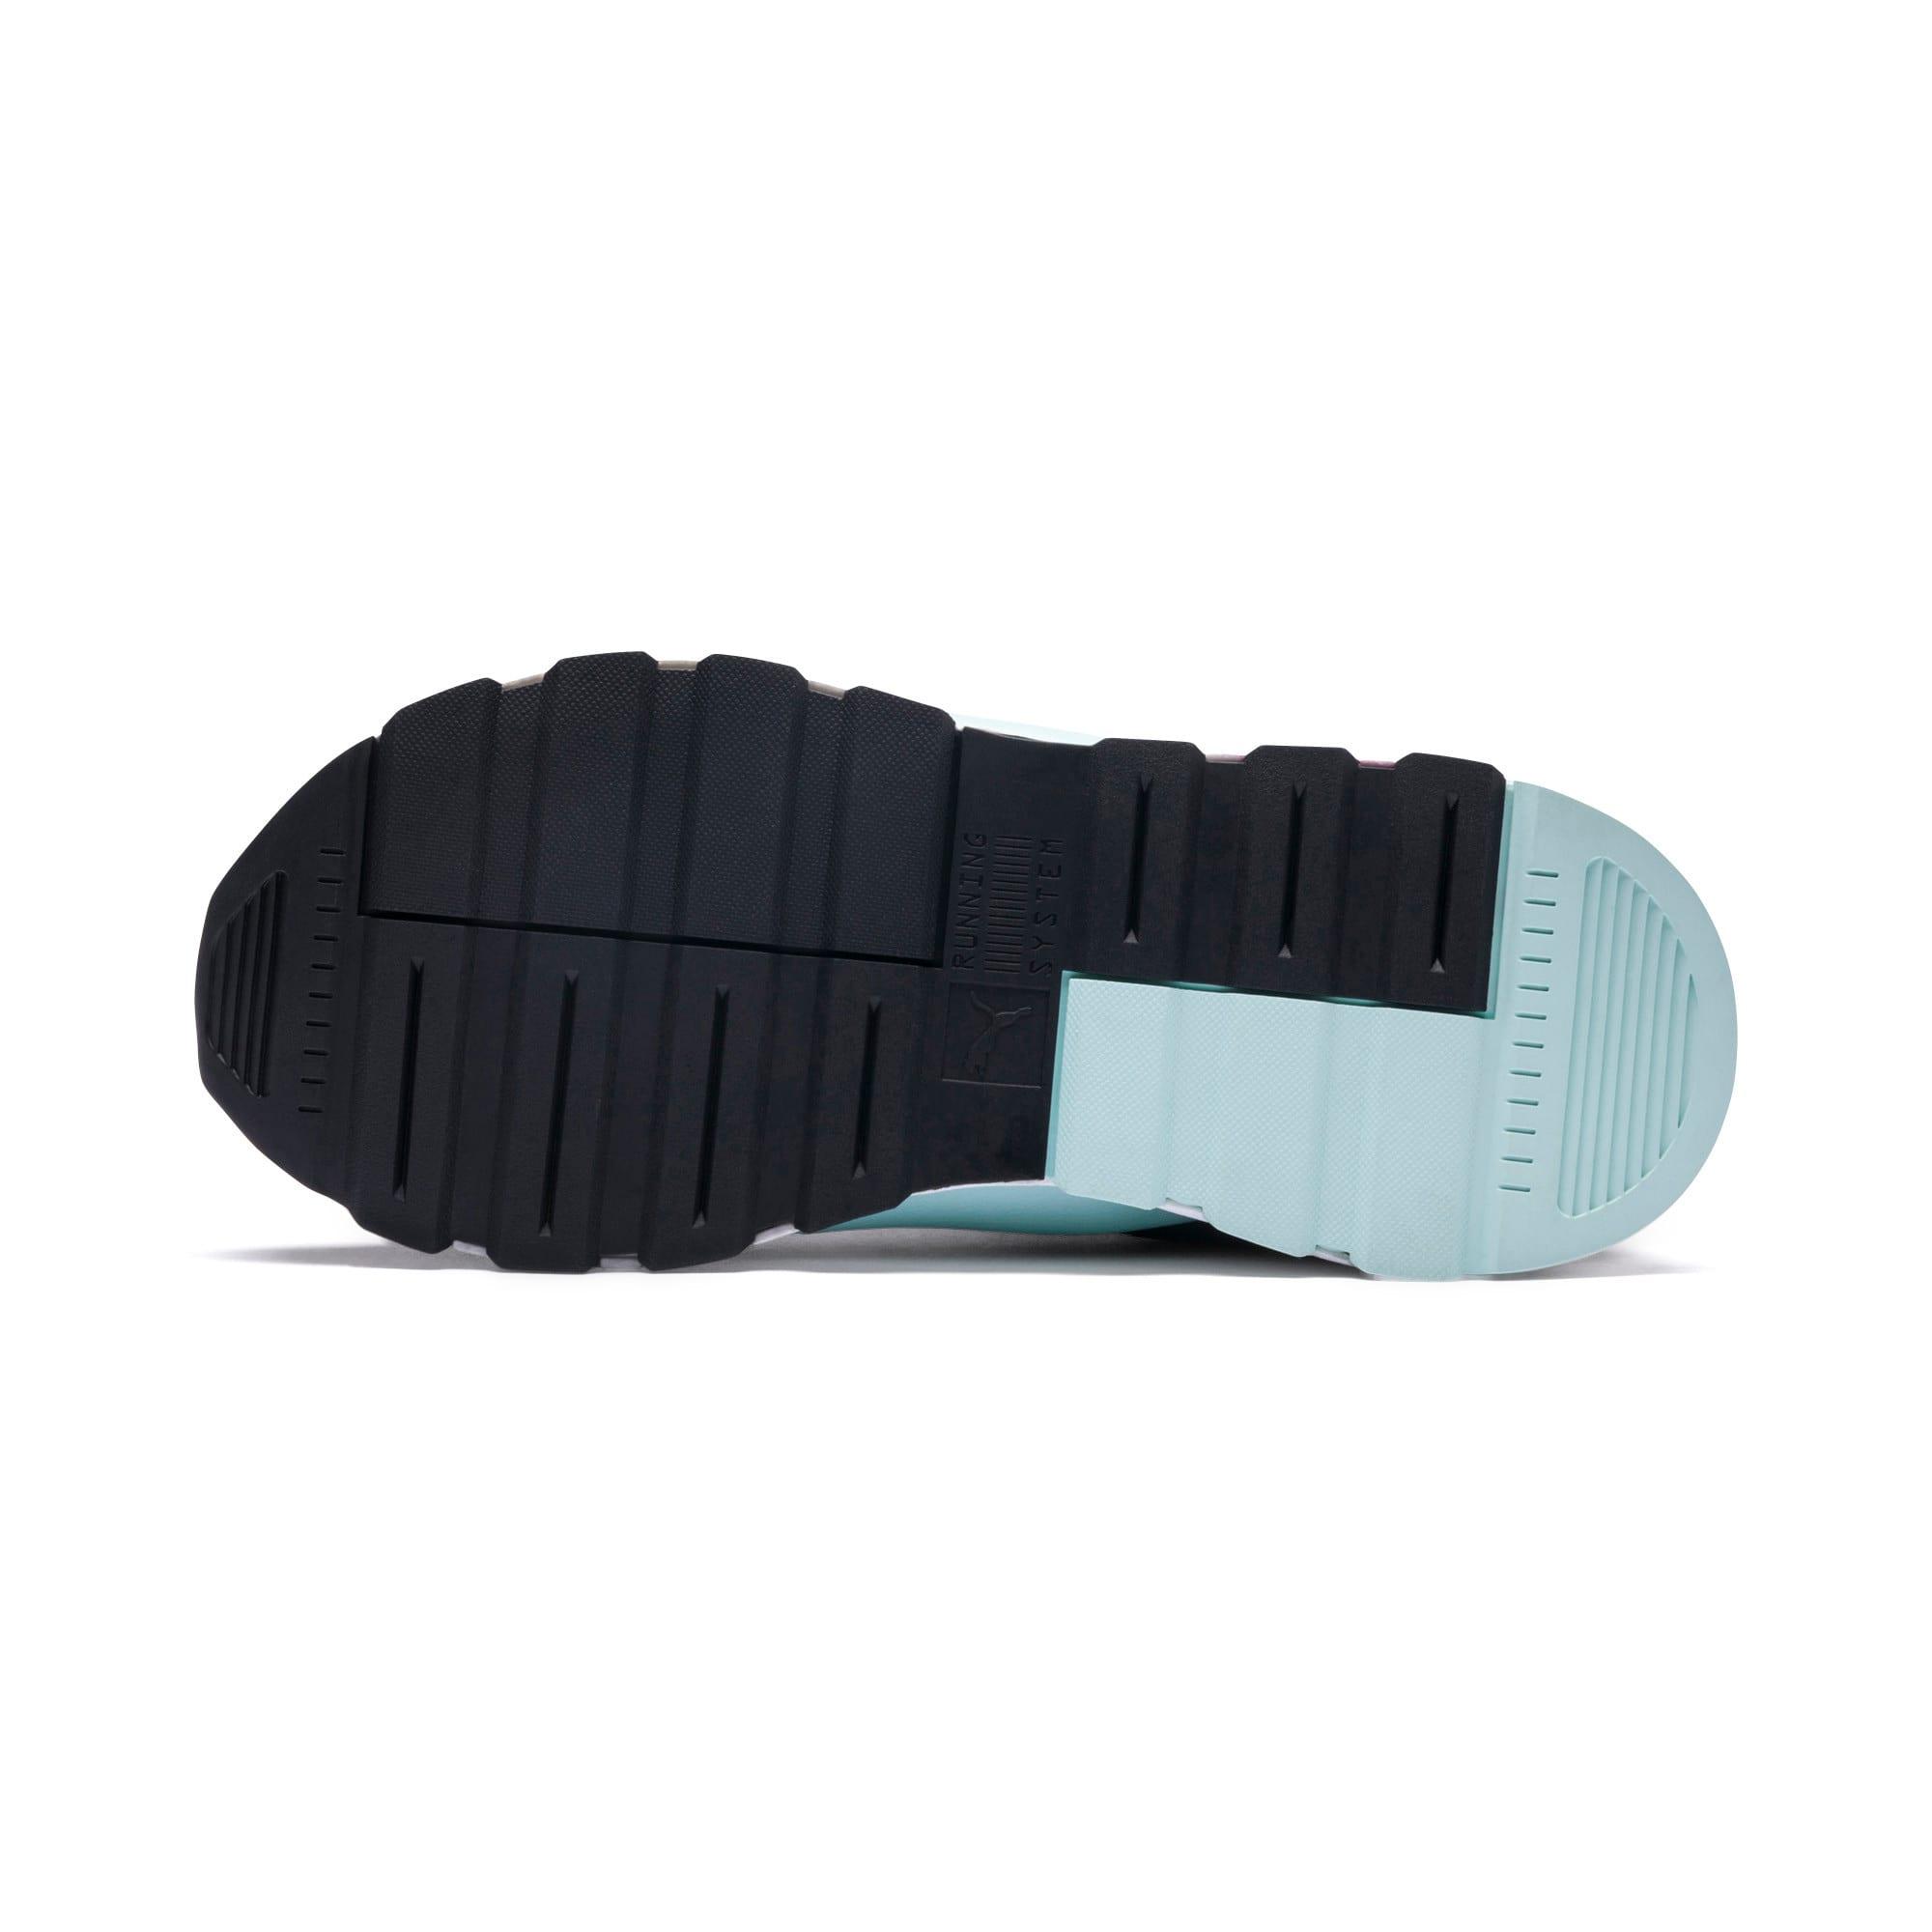 Thumbnail 3 of RS-0 Winter Inj Toys Sneakers JR, Puma Black-Pale Pink, medium